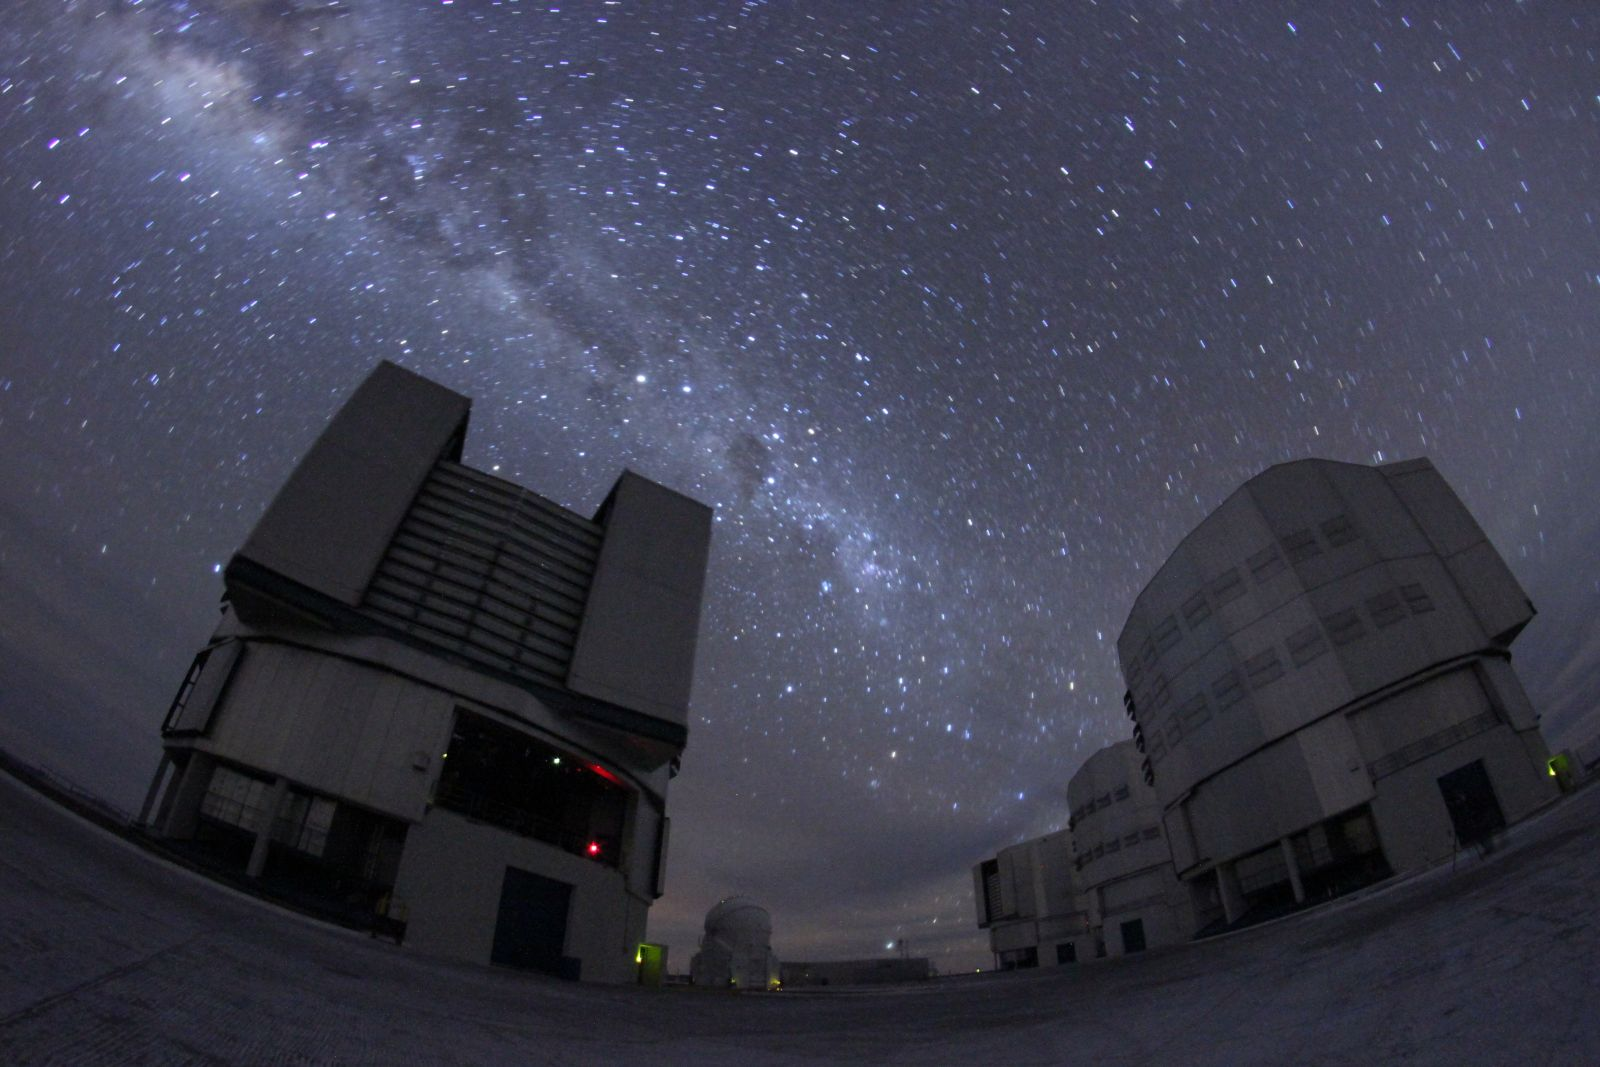 Milchstraße über dem Very Large Telescope